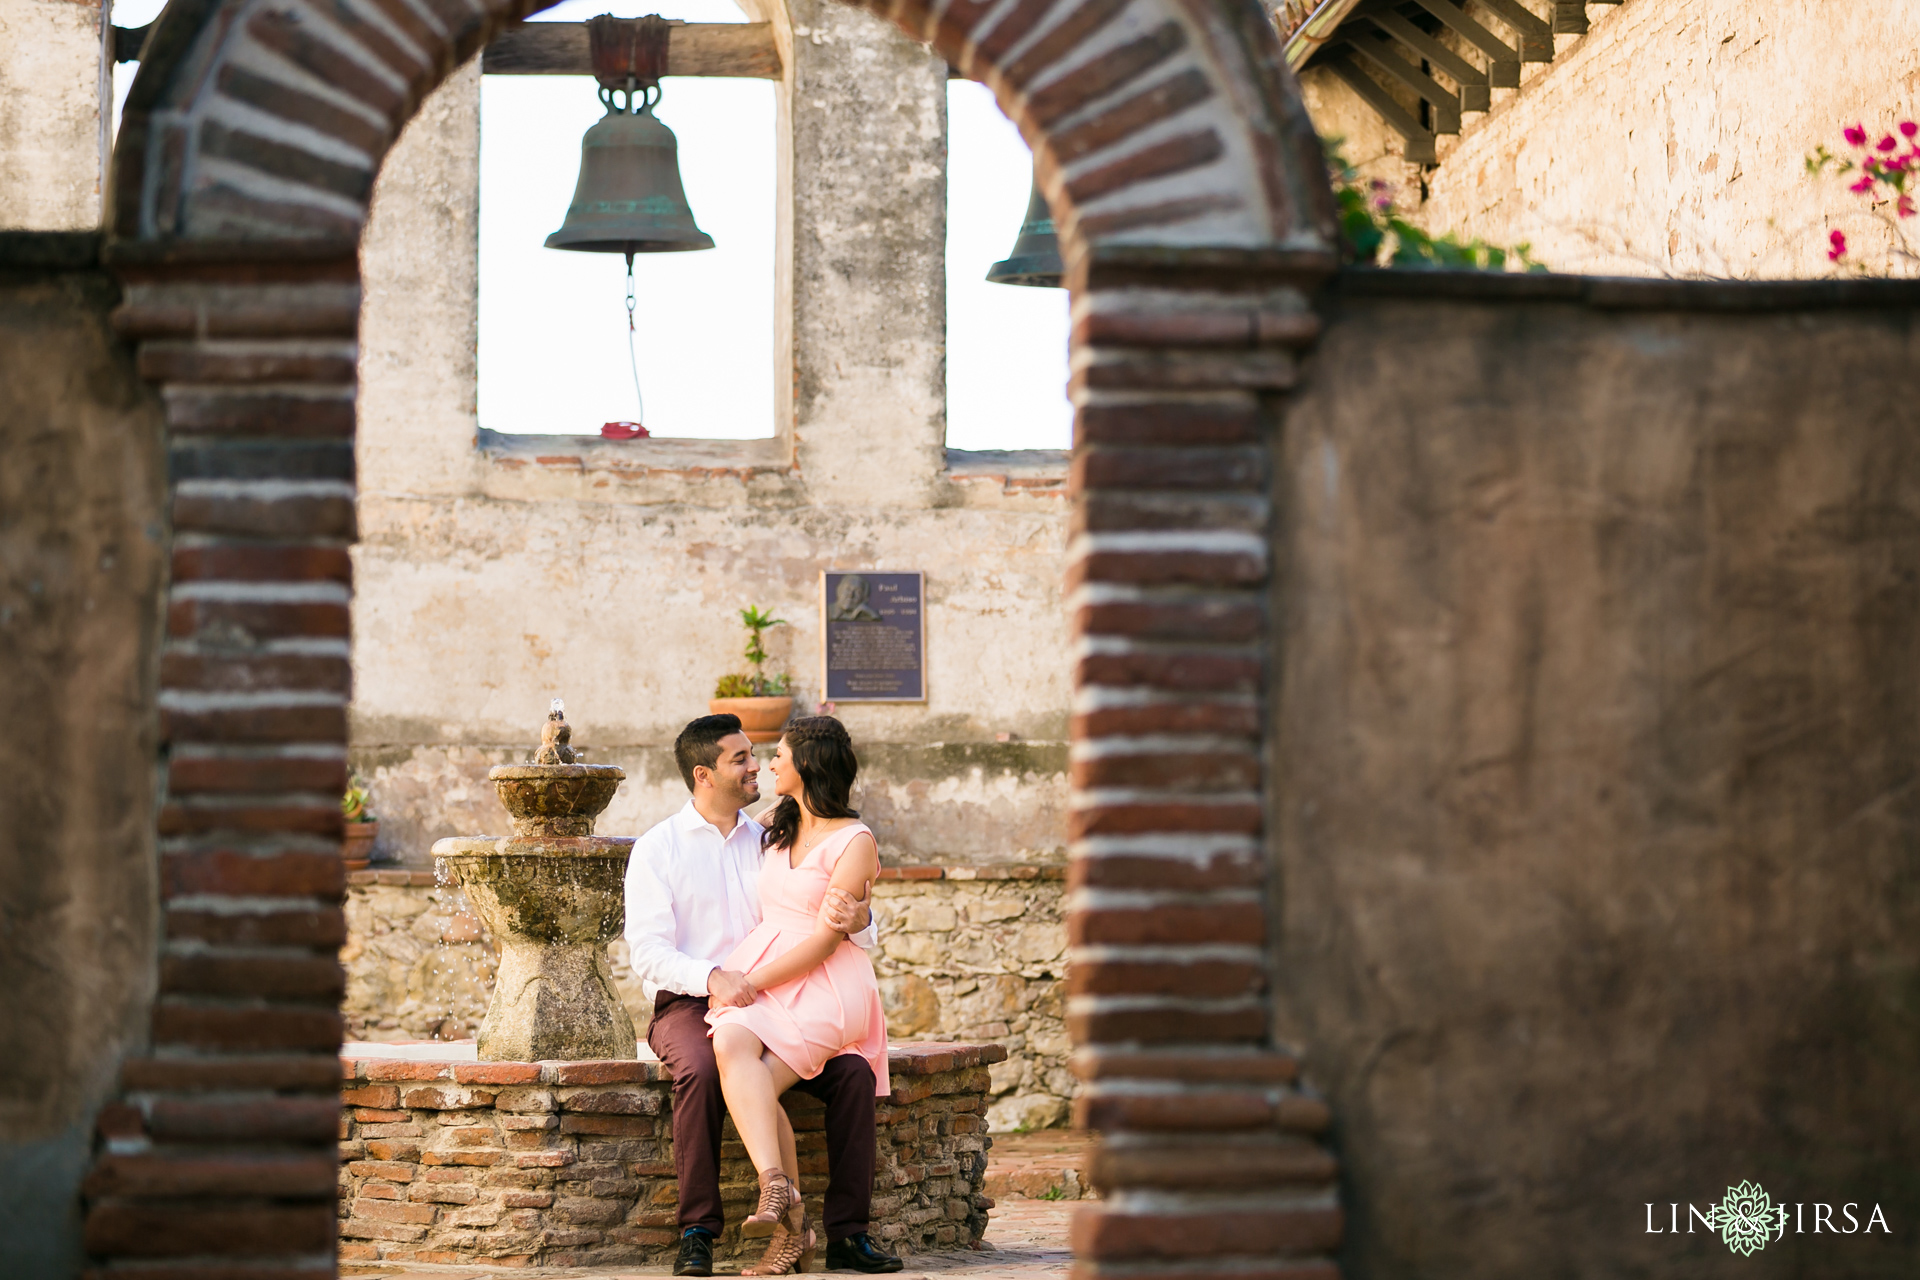 07-Mission-San-Juan-Capistrano-Engagement-Photography